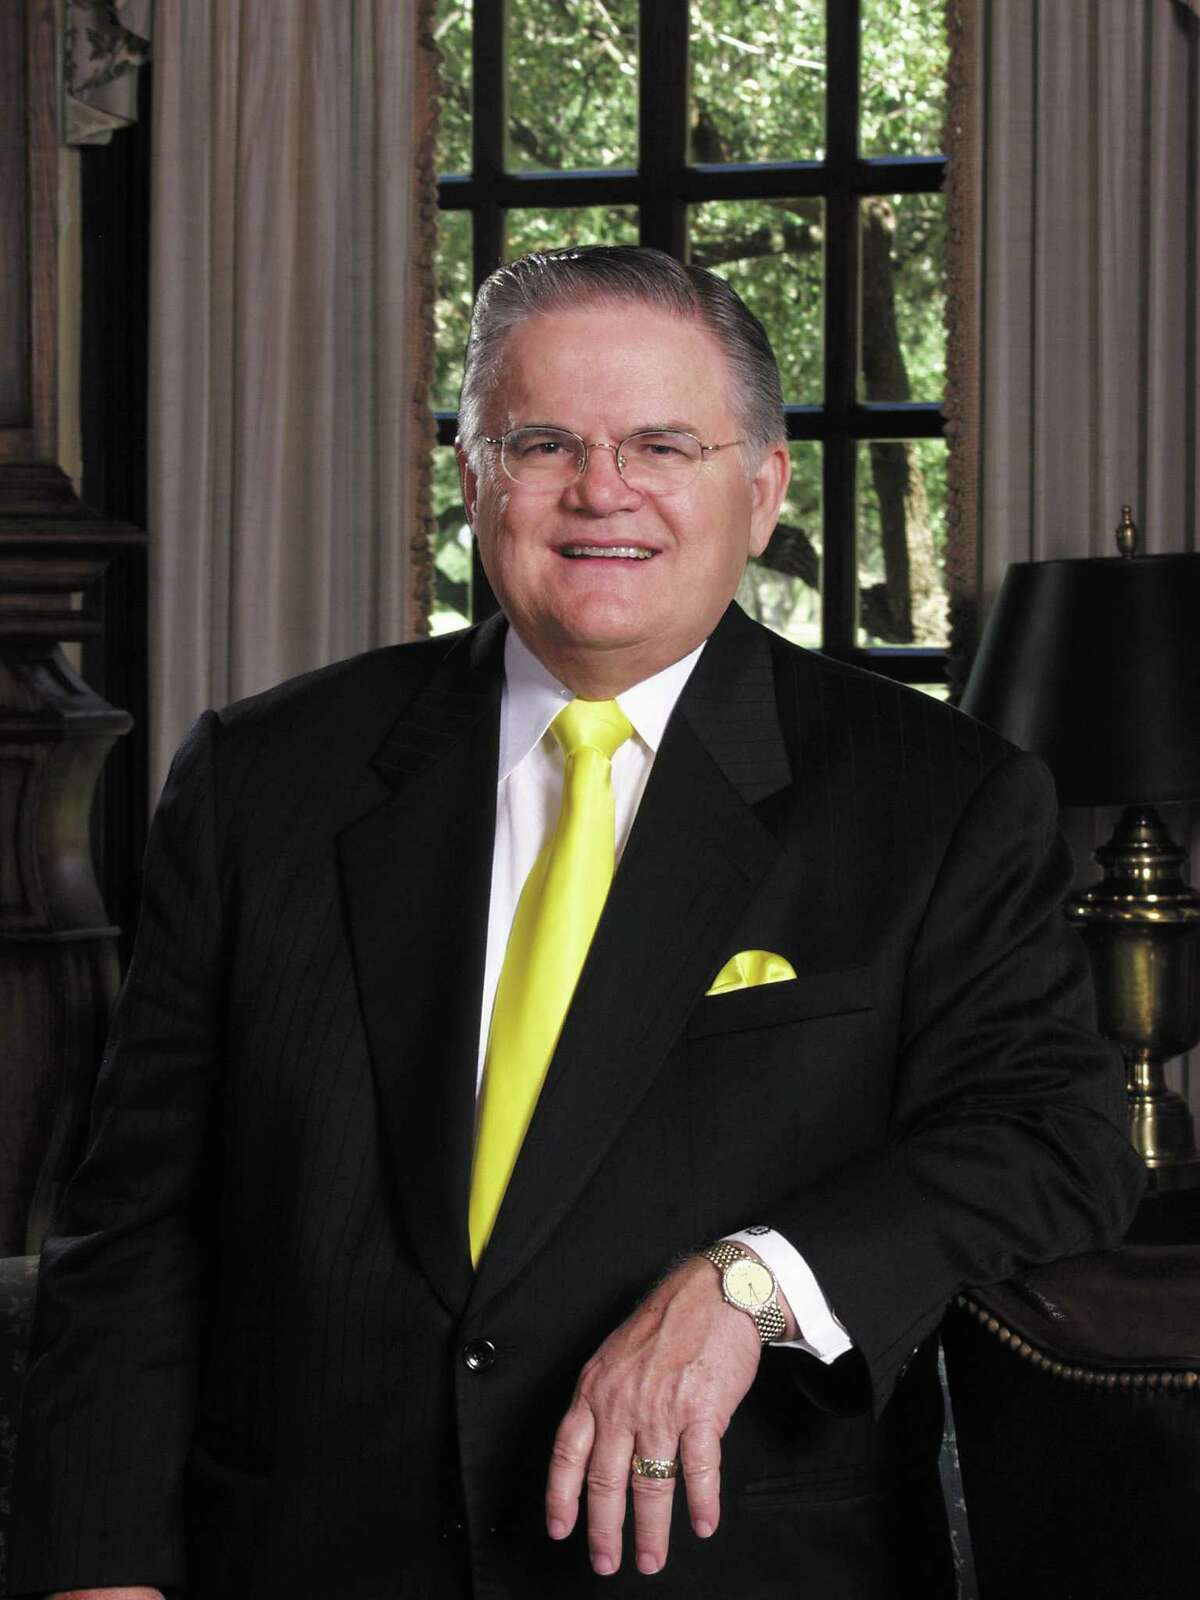 Dr. John C. Hagee is the founder and Senior Pastor of Cornerstone Church in San Antonio, Texas